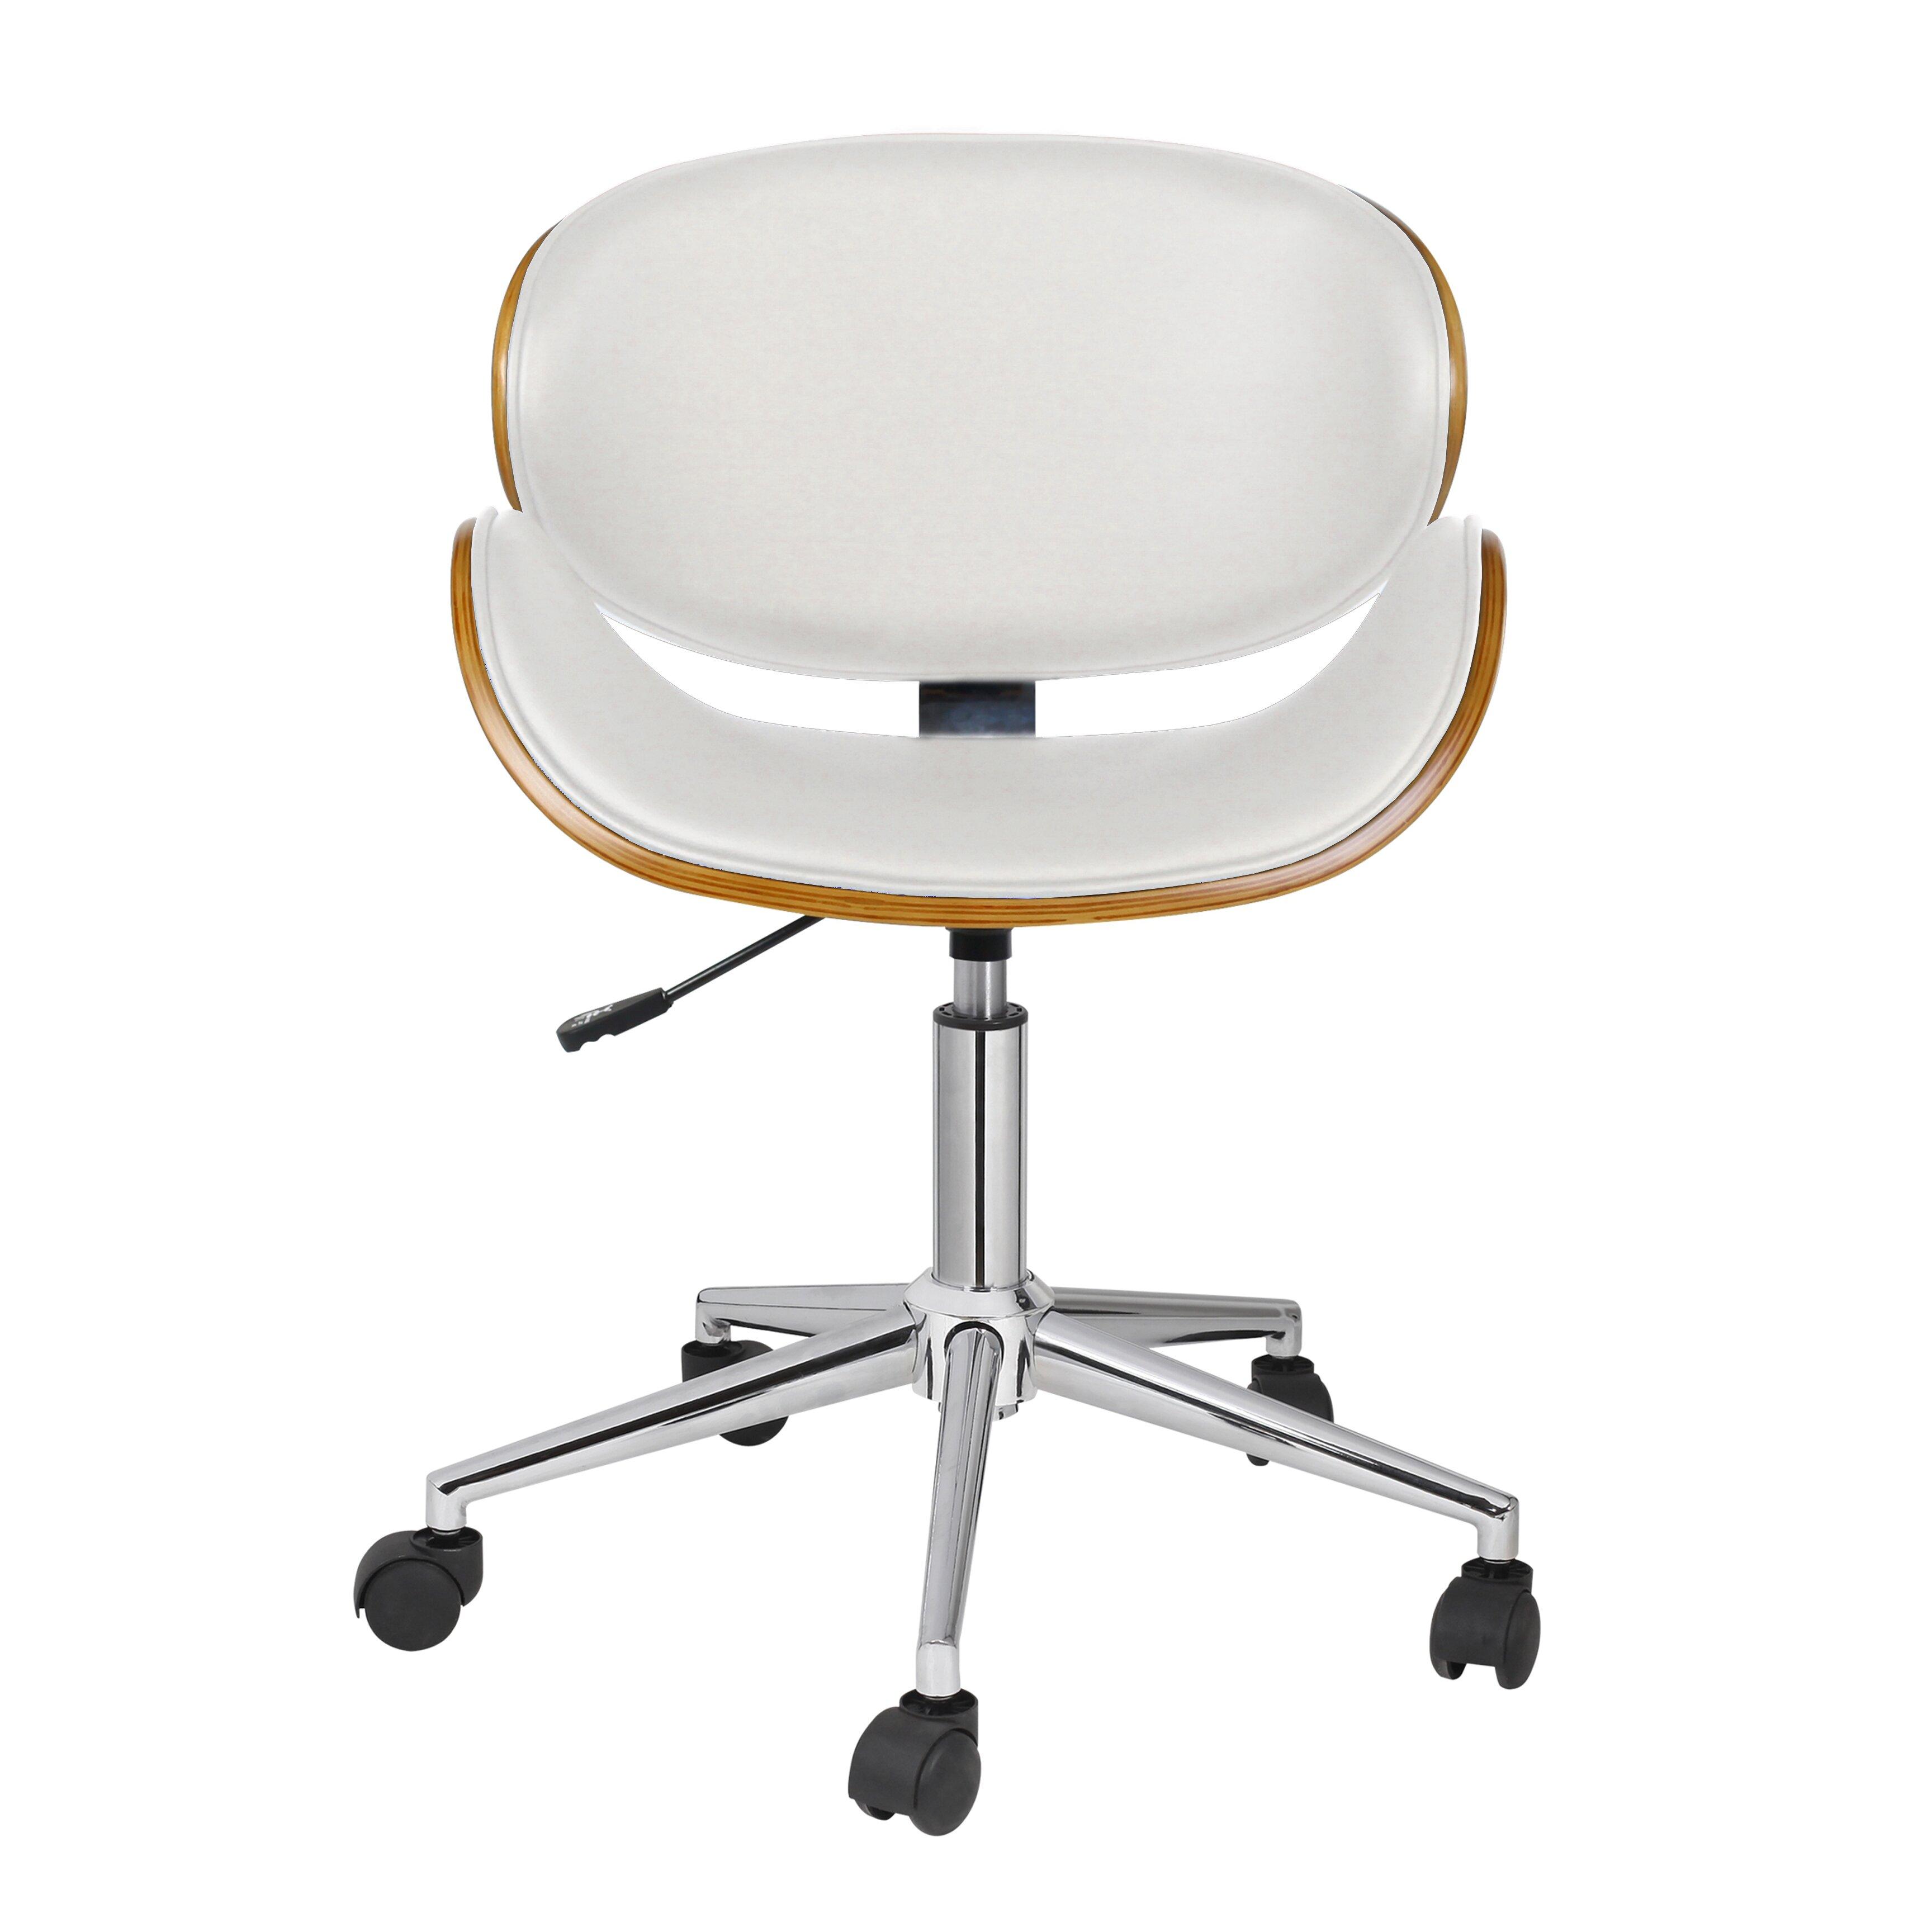 Wood Desk Chair Dimensions